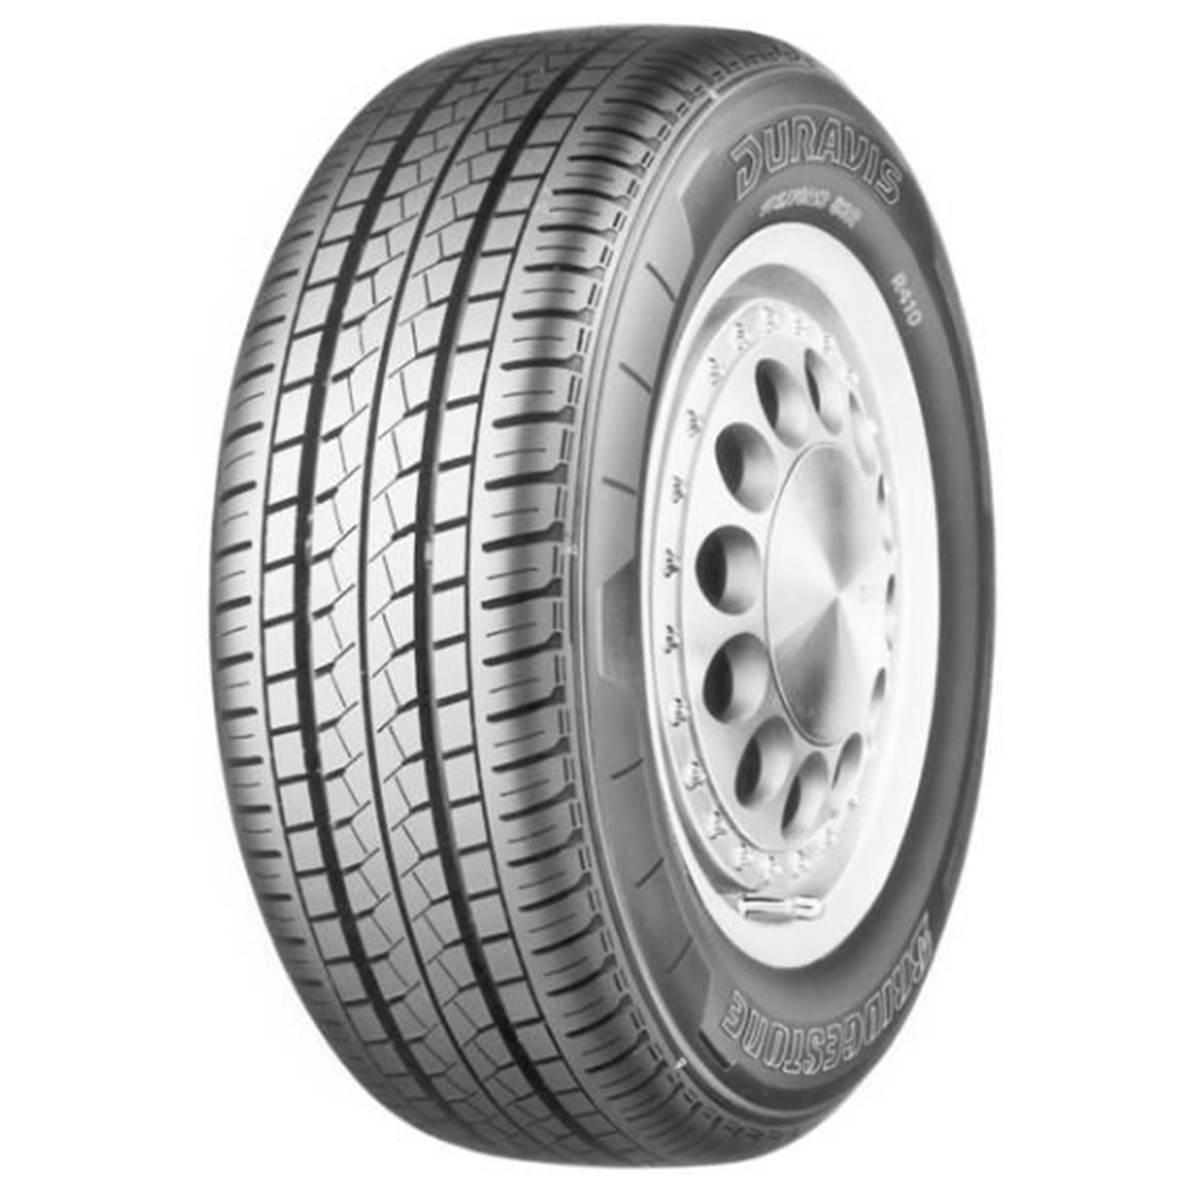 Pneu Camionnette Bridgestone 175/65R14 90T Duravis R410